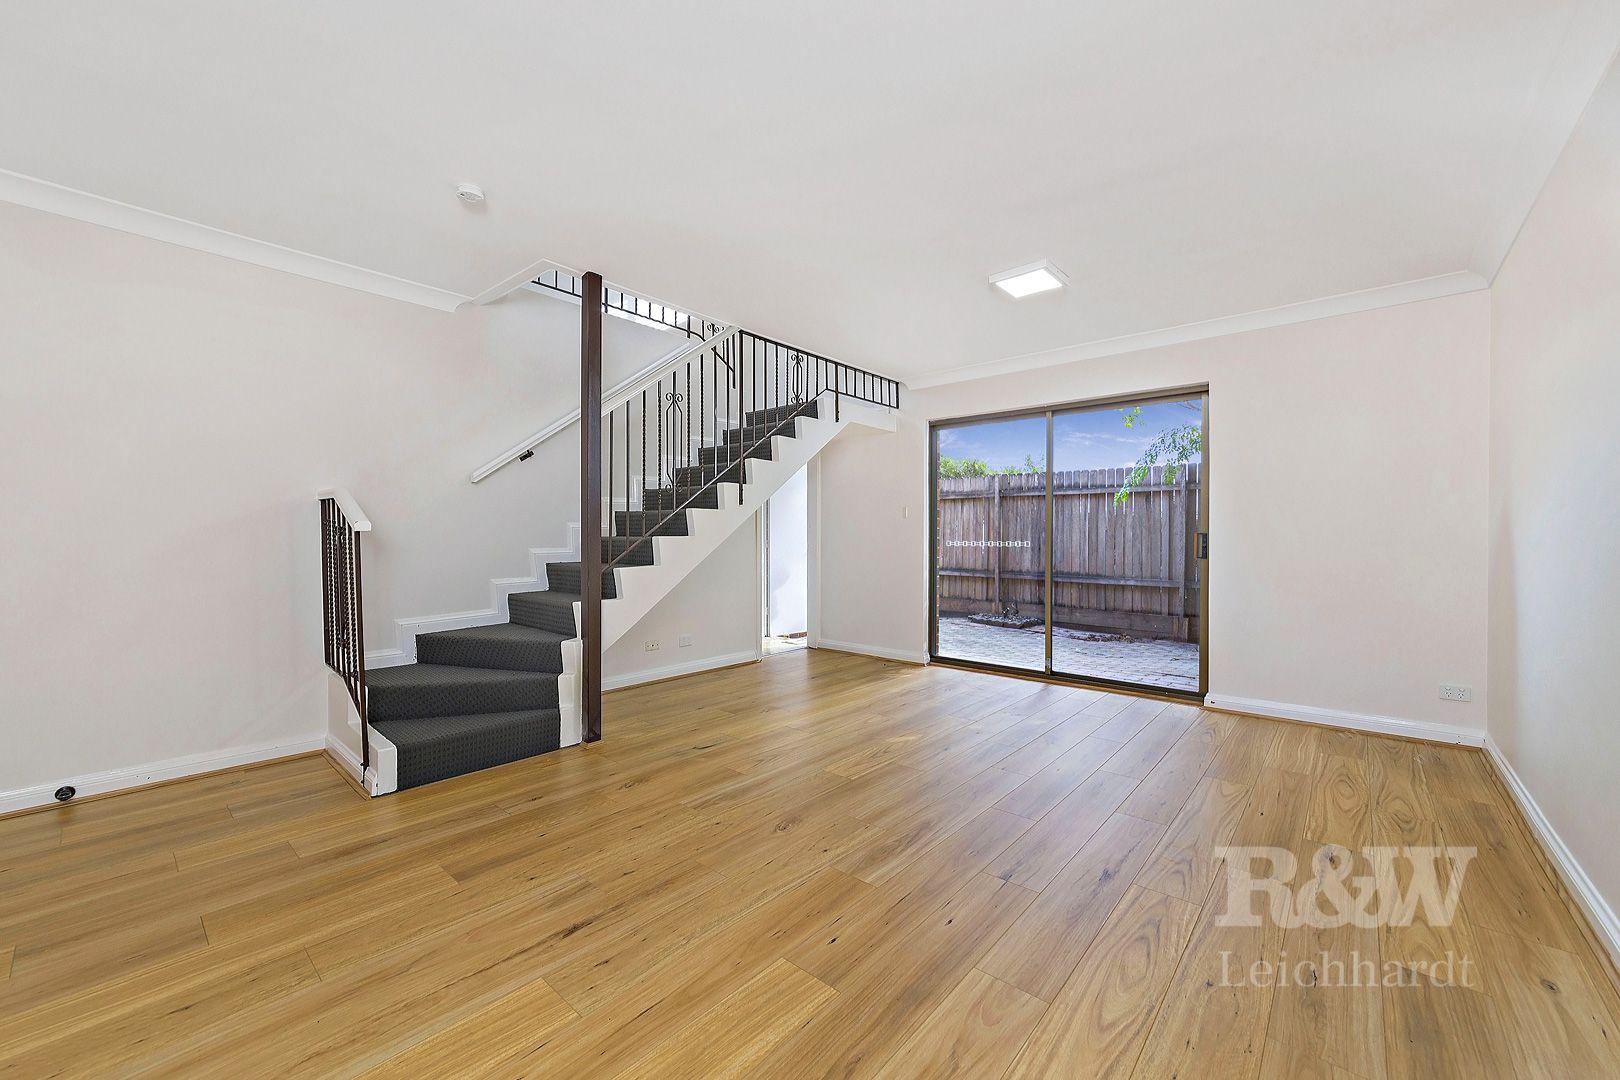 3/184 Elswick Street, Leichhardt NSW 2040, Image 1